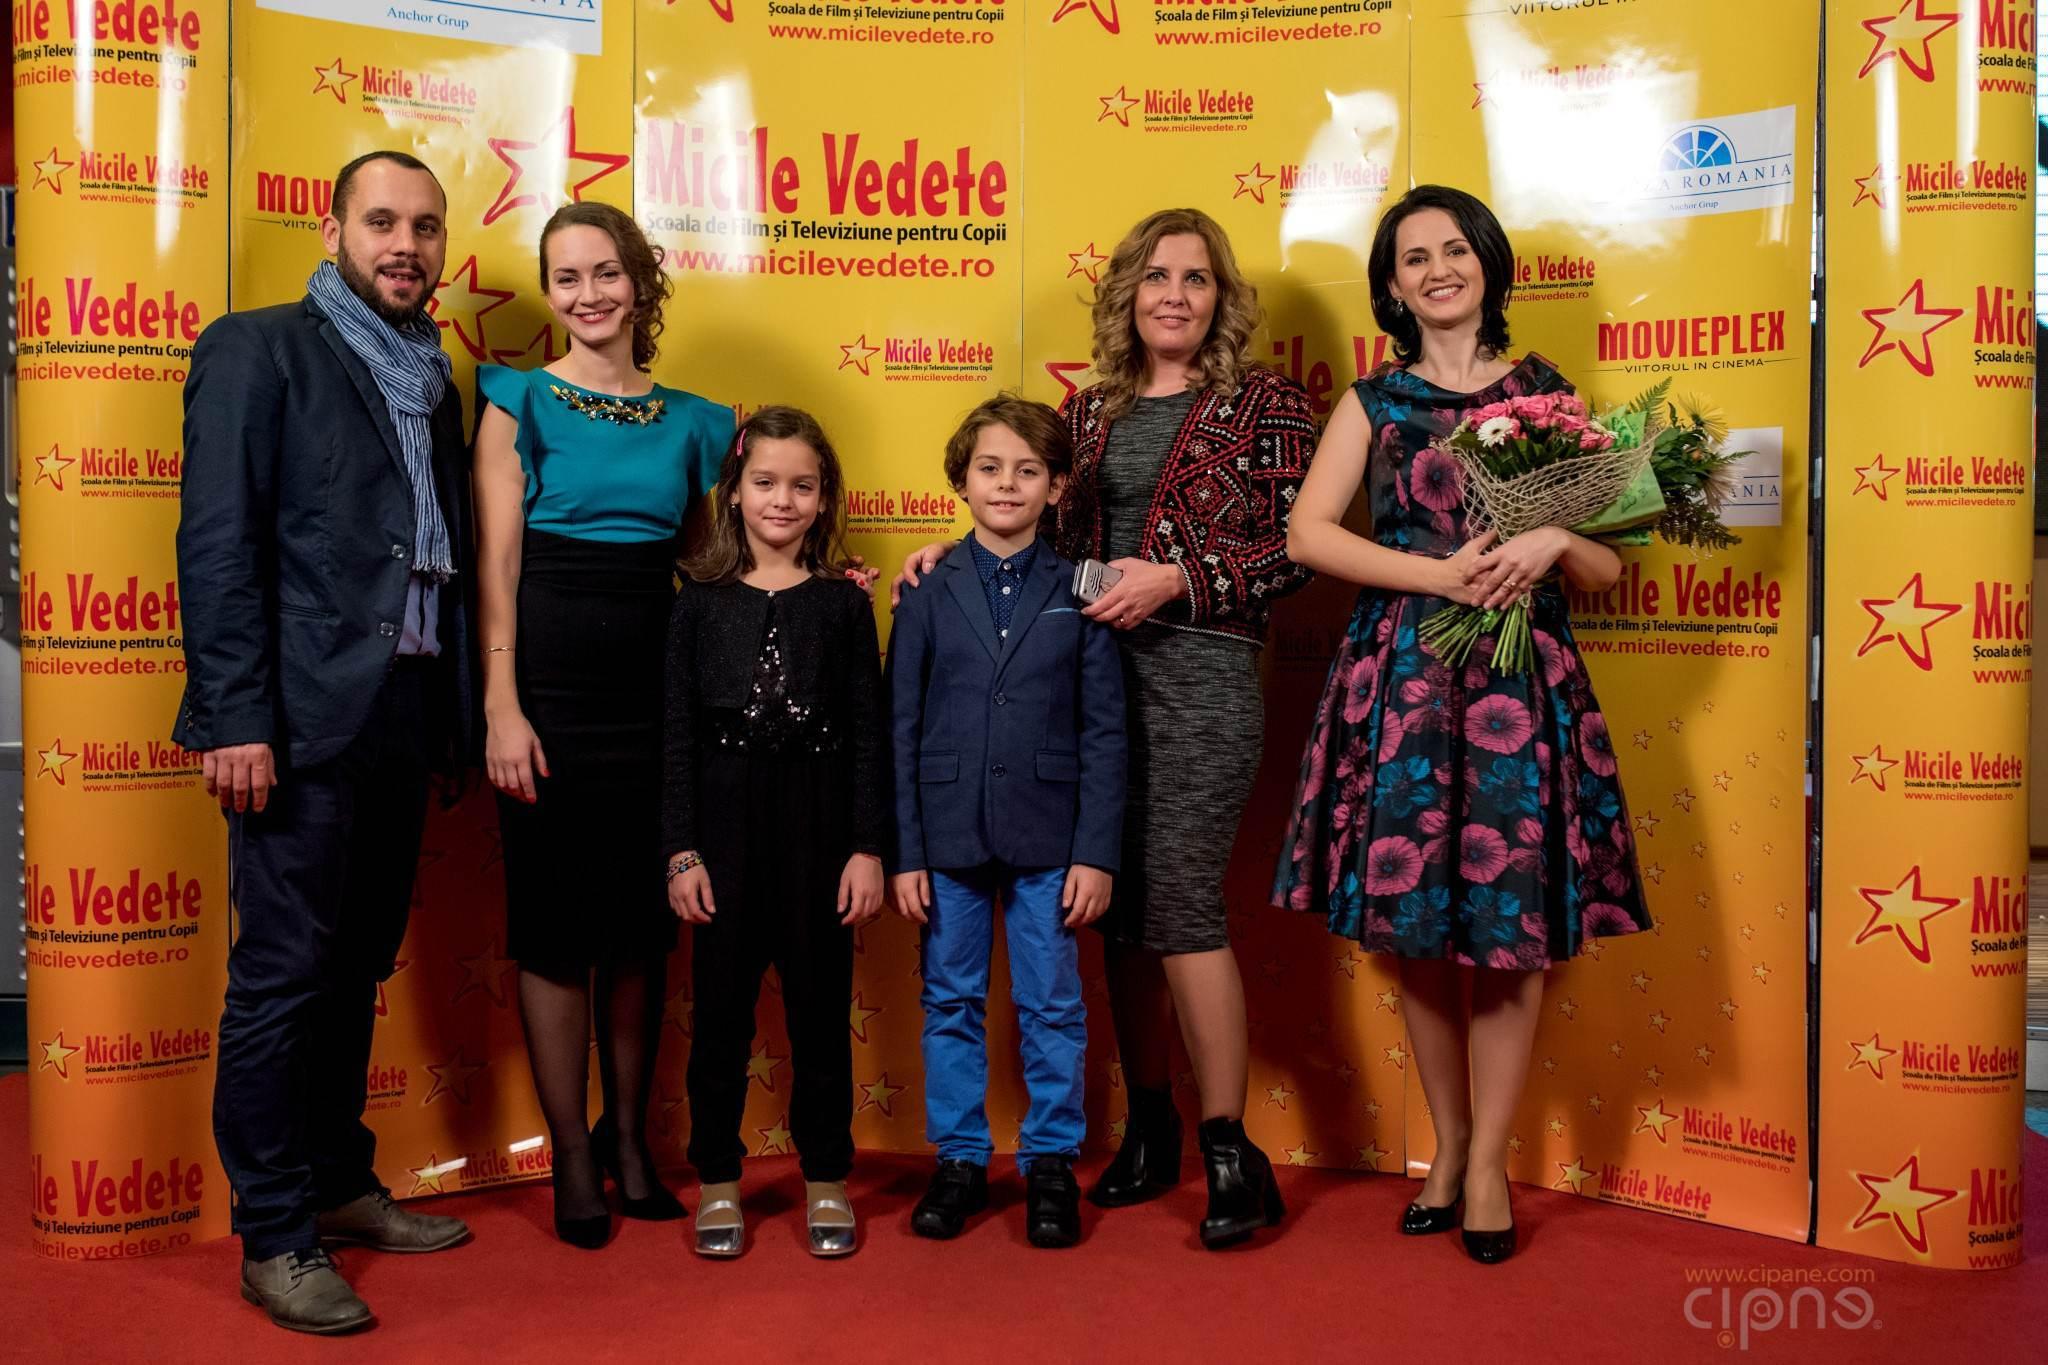 by © Ciprian Vlăduț - www.cipane.com